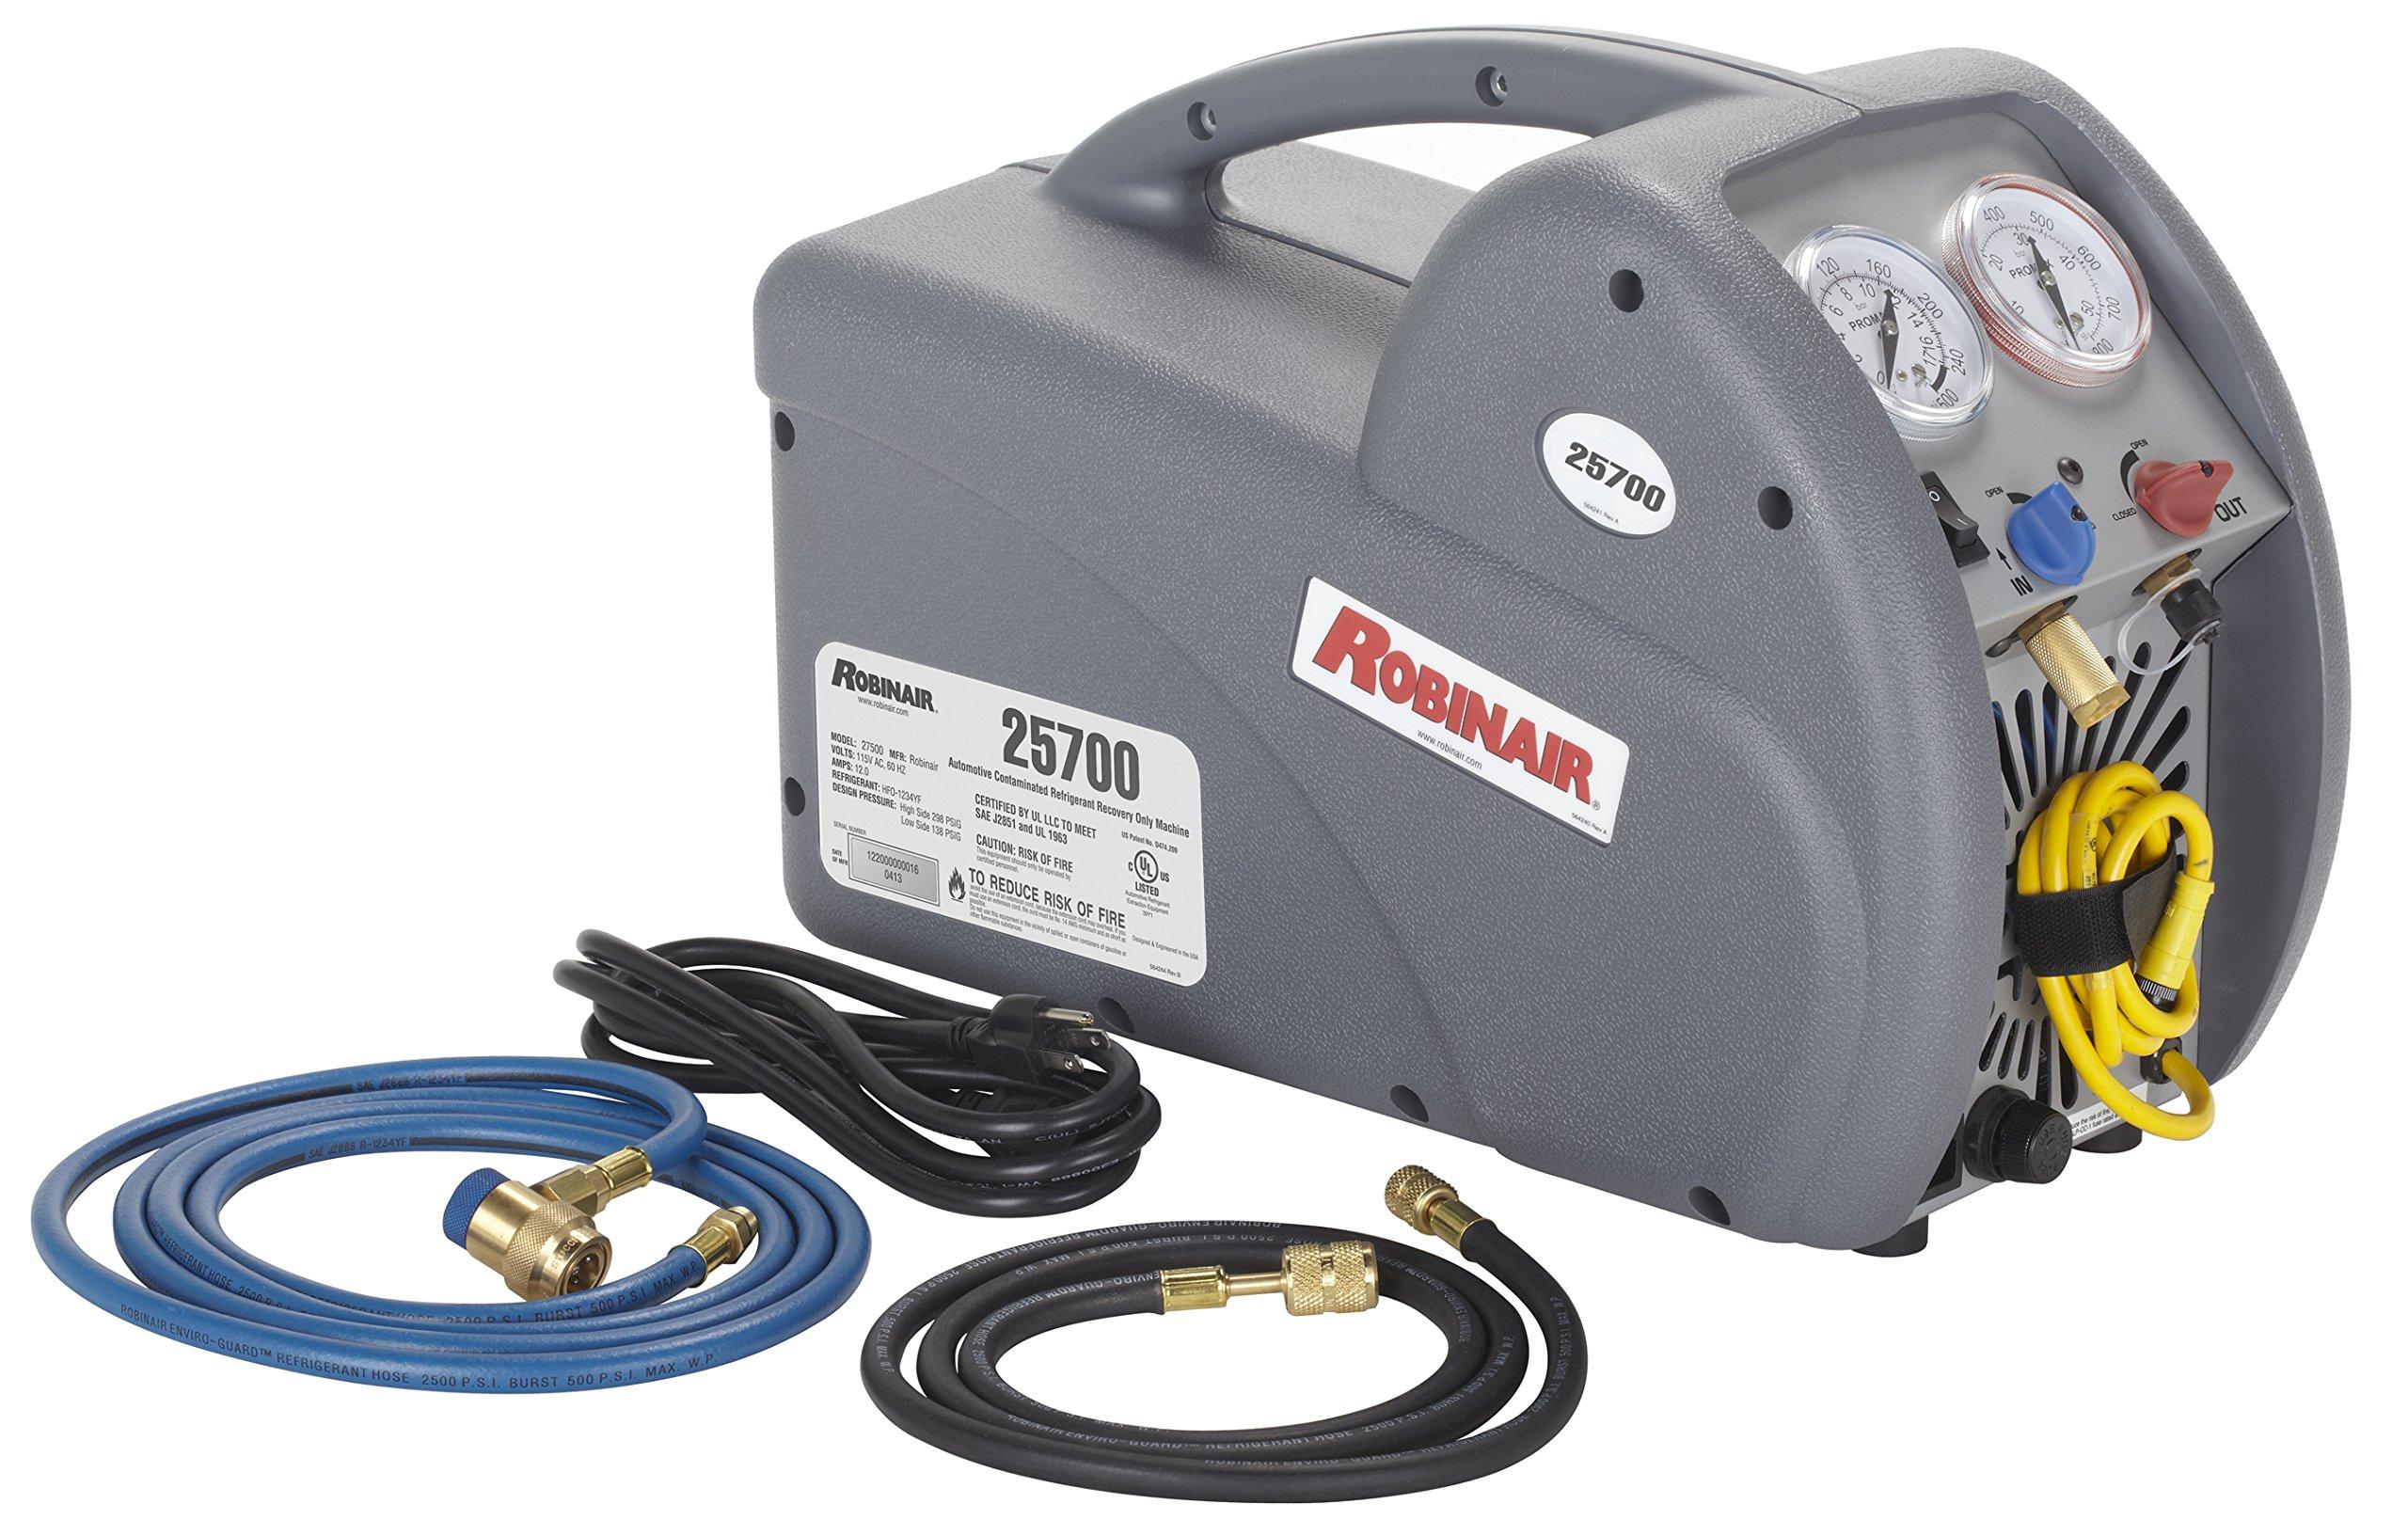 Robinair 25700 Contaminated Refrigerant Recovery Machine for R-134a and R-1234yf